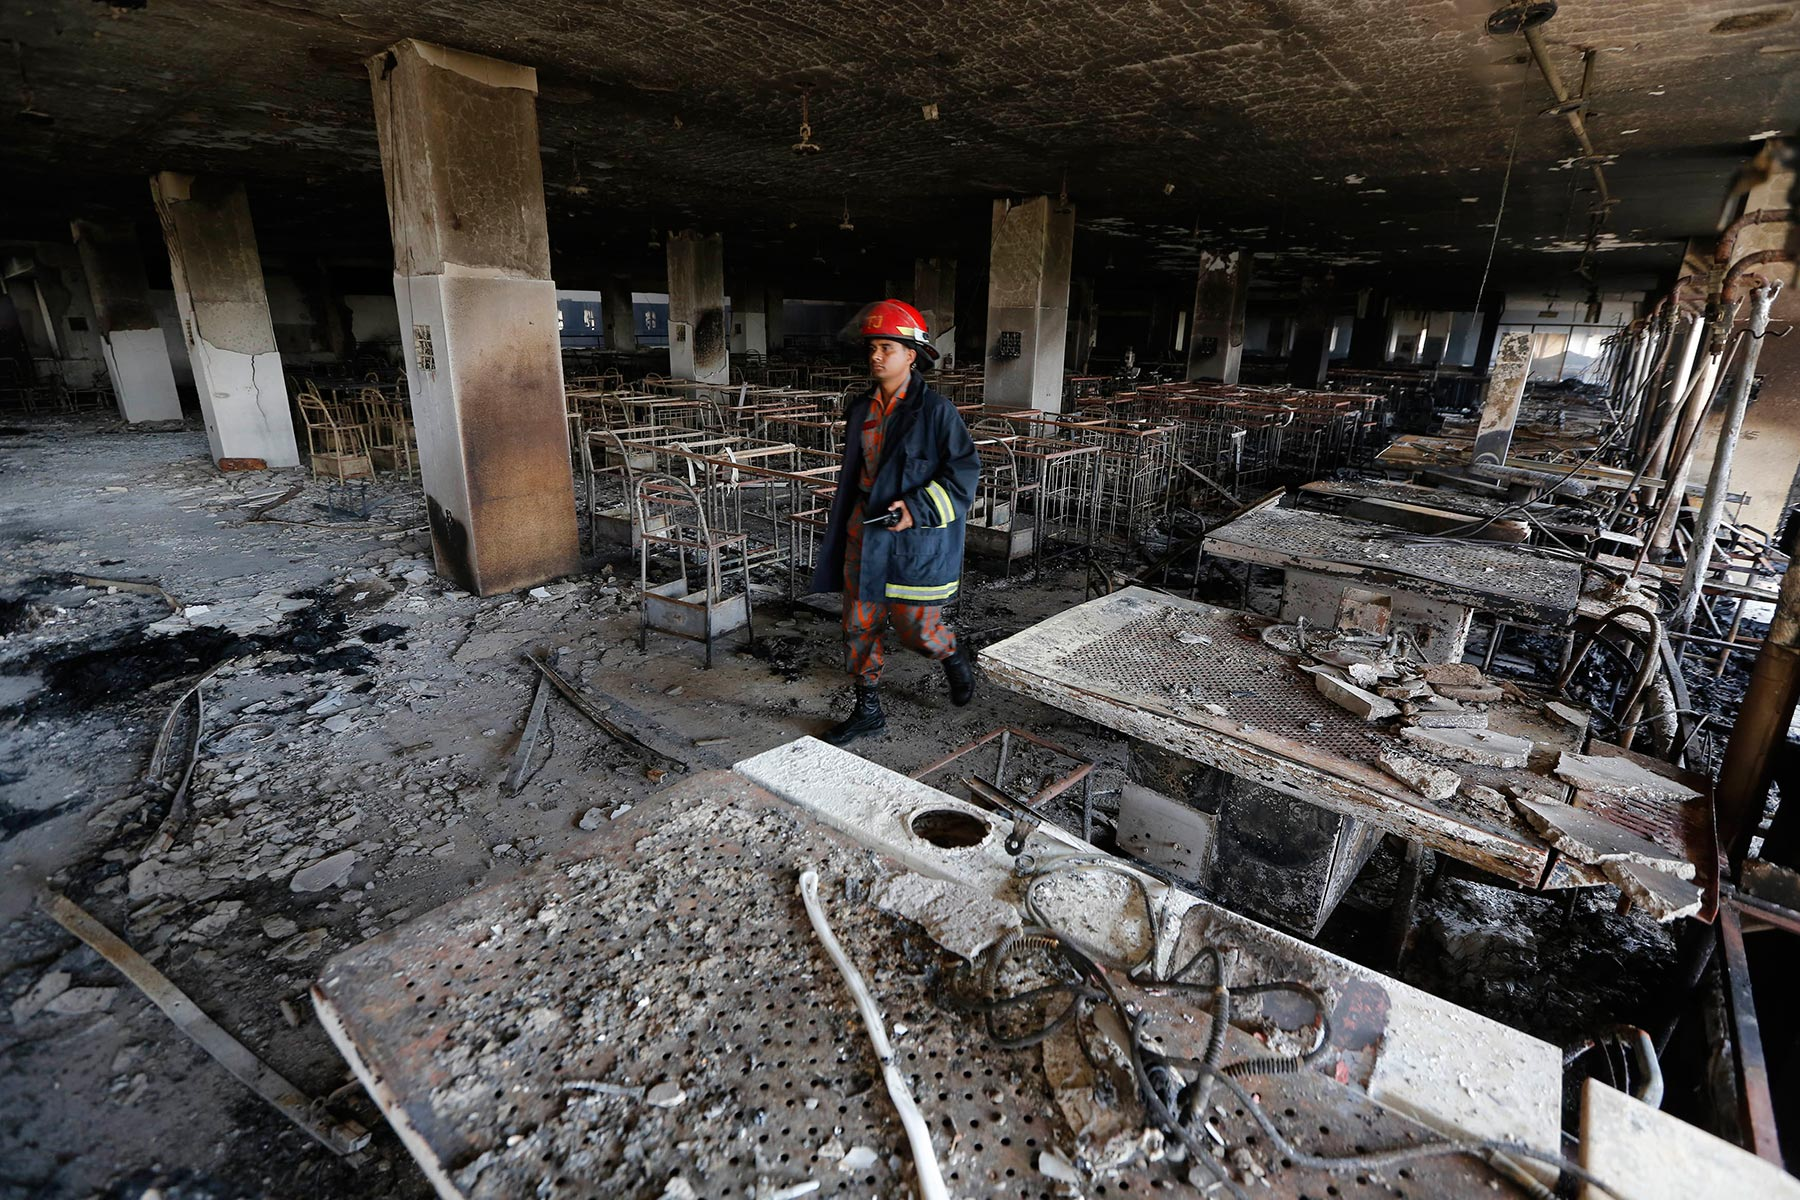 In Bangladesh, the sham of Shams factory   Al Jazeera America